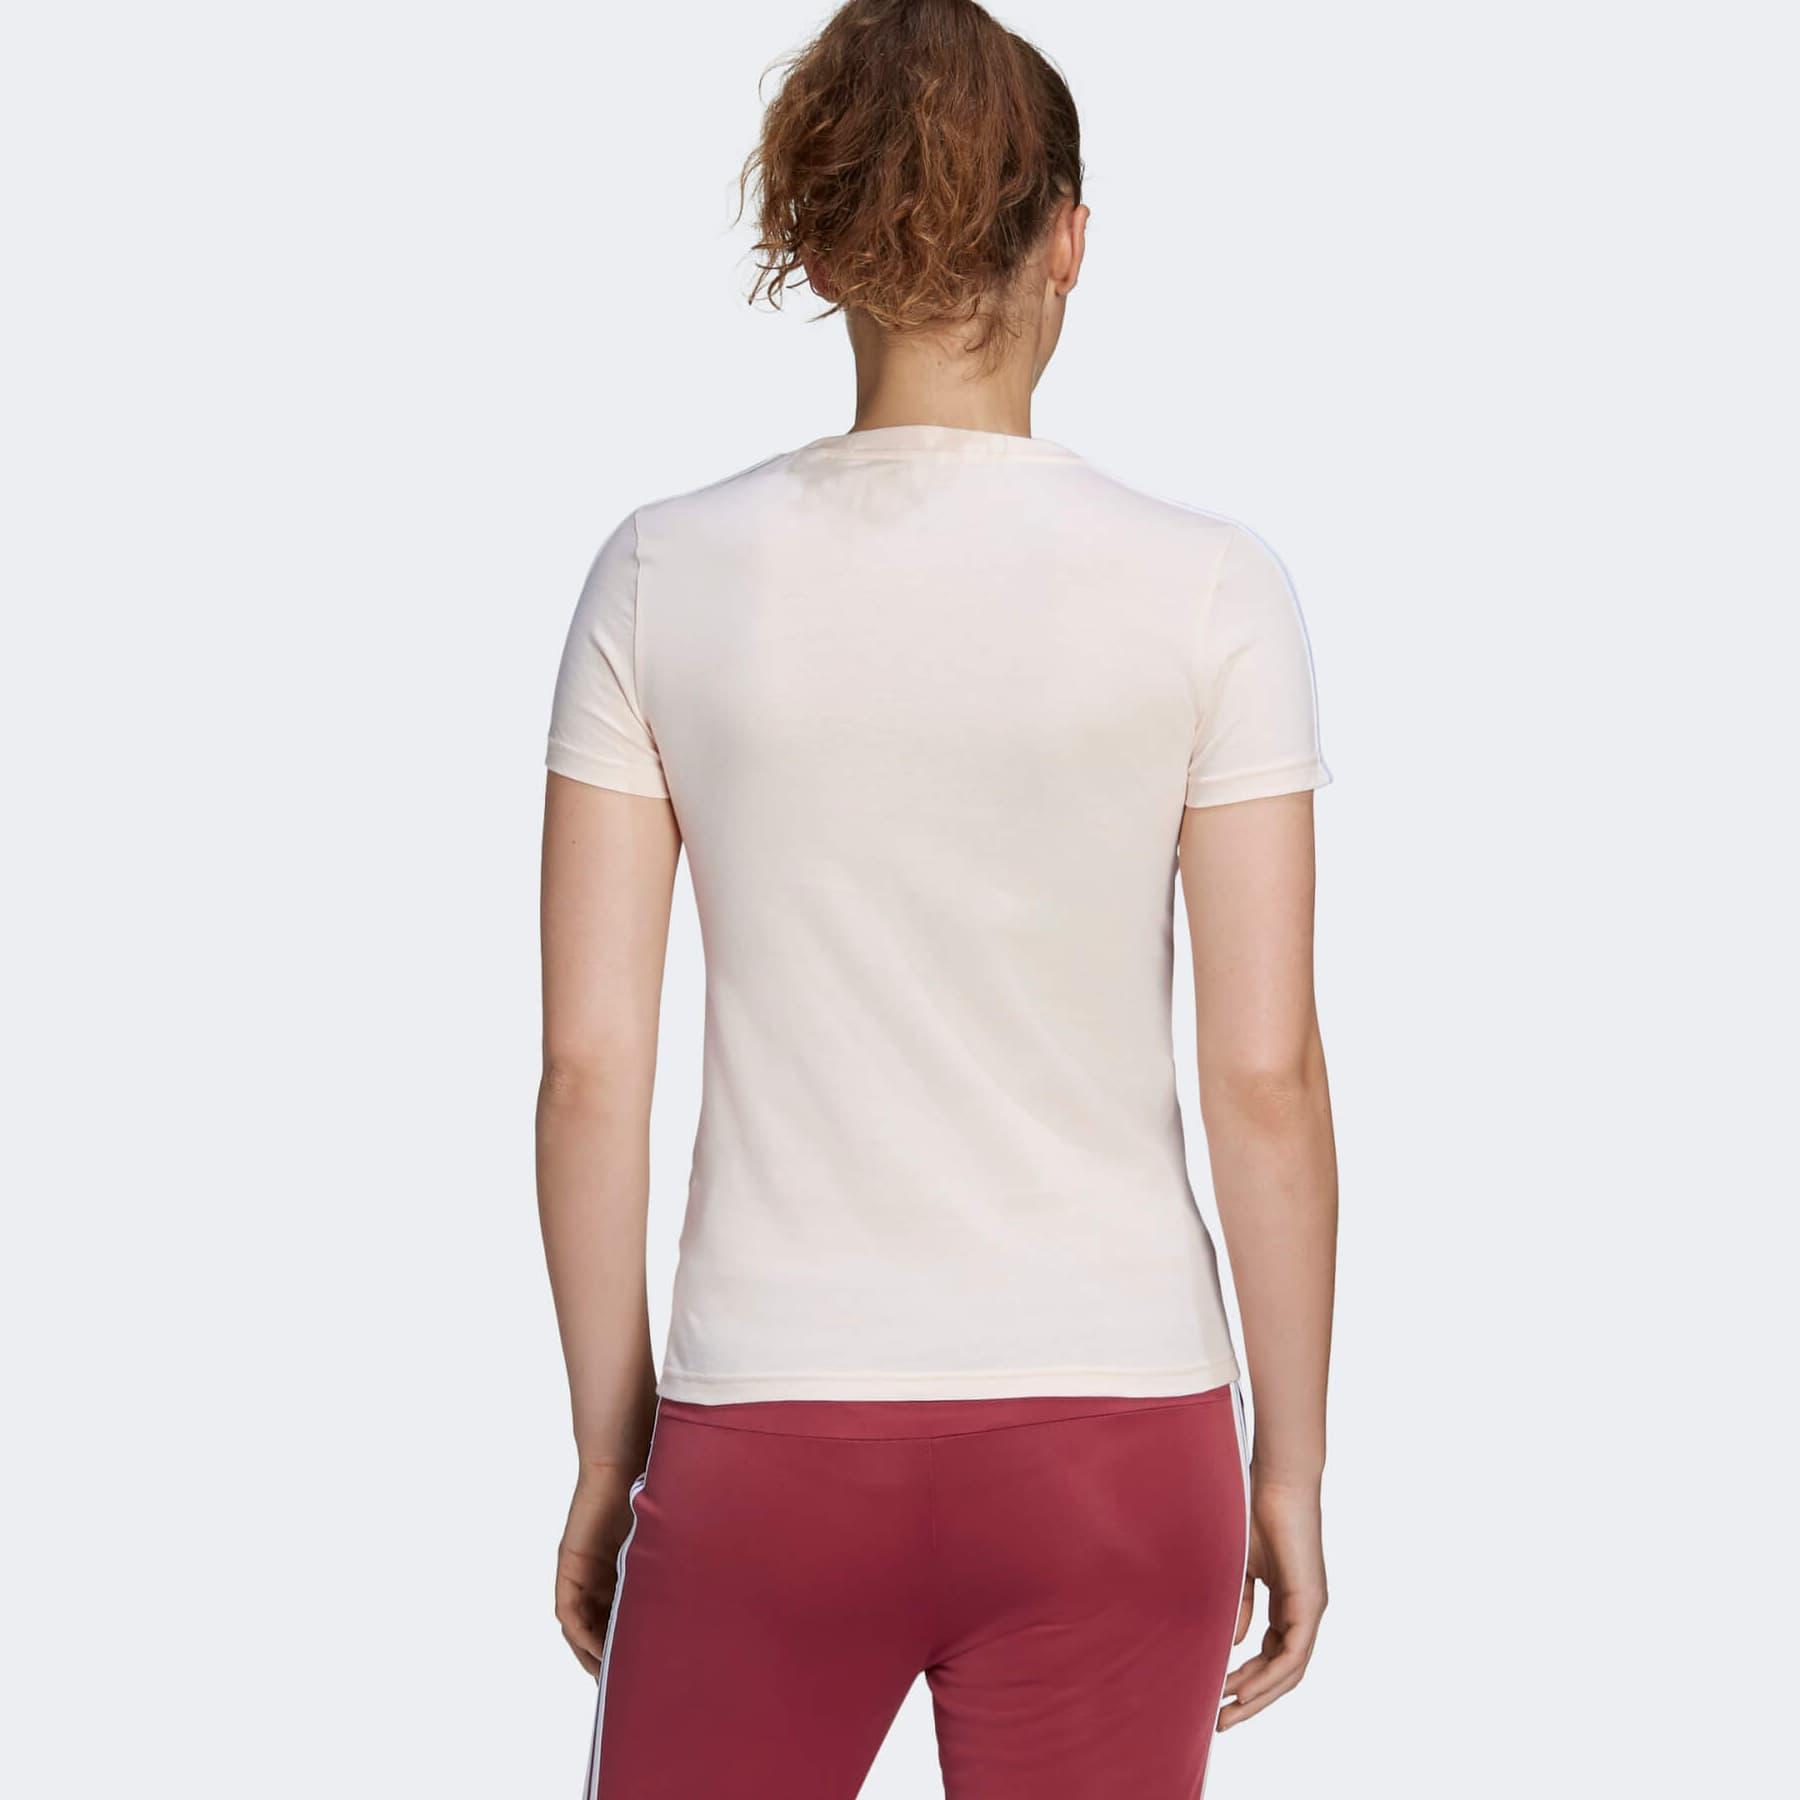 Essentials 3 Bantlı Kadın Pembe Spor Tişört